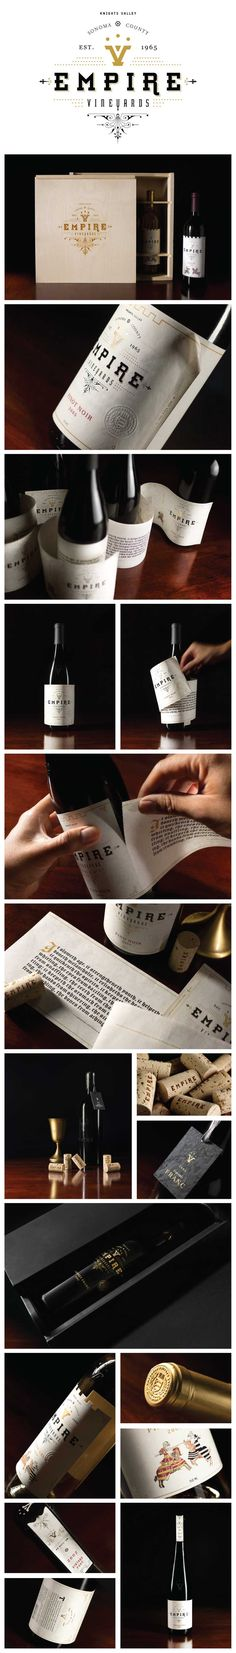 PROJECT NUMER / FRED CARRIEDO Cool #packaging #branding for all #wine loving peeps @SmallBlackRoom @maximum by taninotanino ® vino / wine f